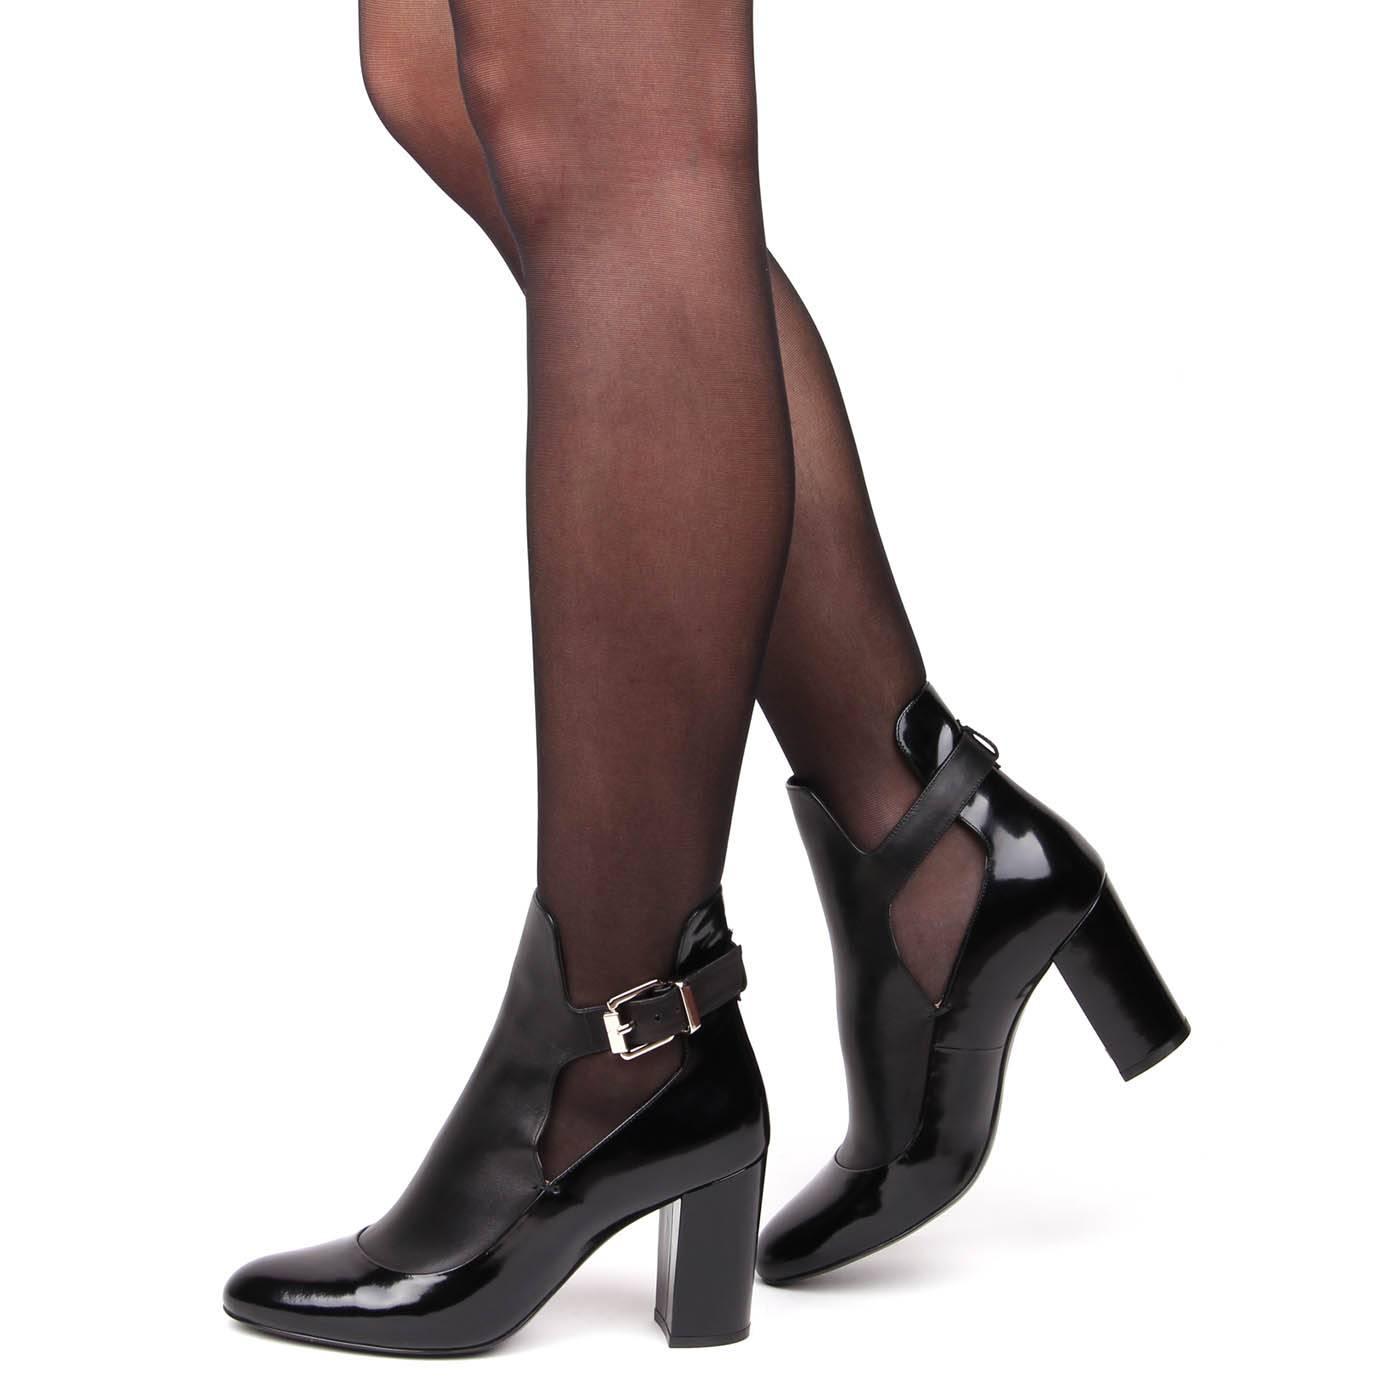 Черевики жіночі Basconi 6235 Чорний купить по выгодной цене в ... f0108ff6be10e